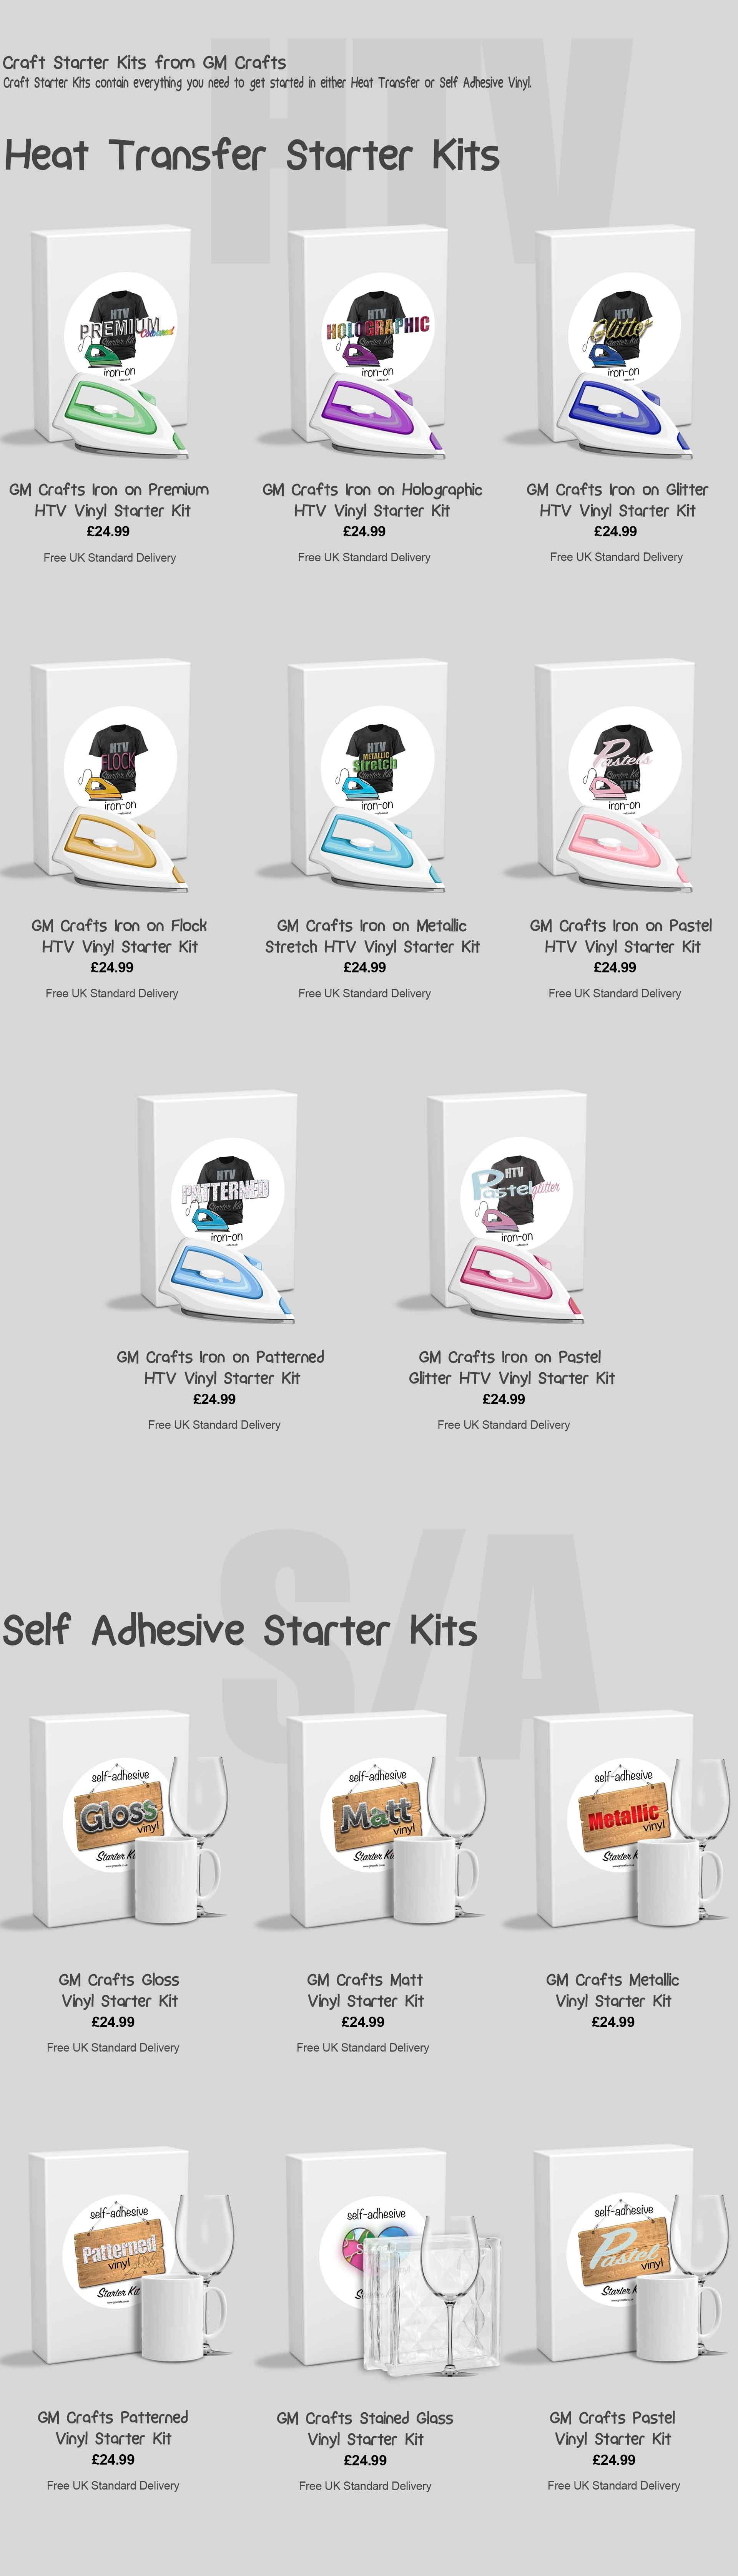 Desktop-Starter-Kits-Page-May-2019